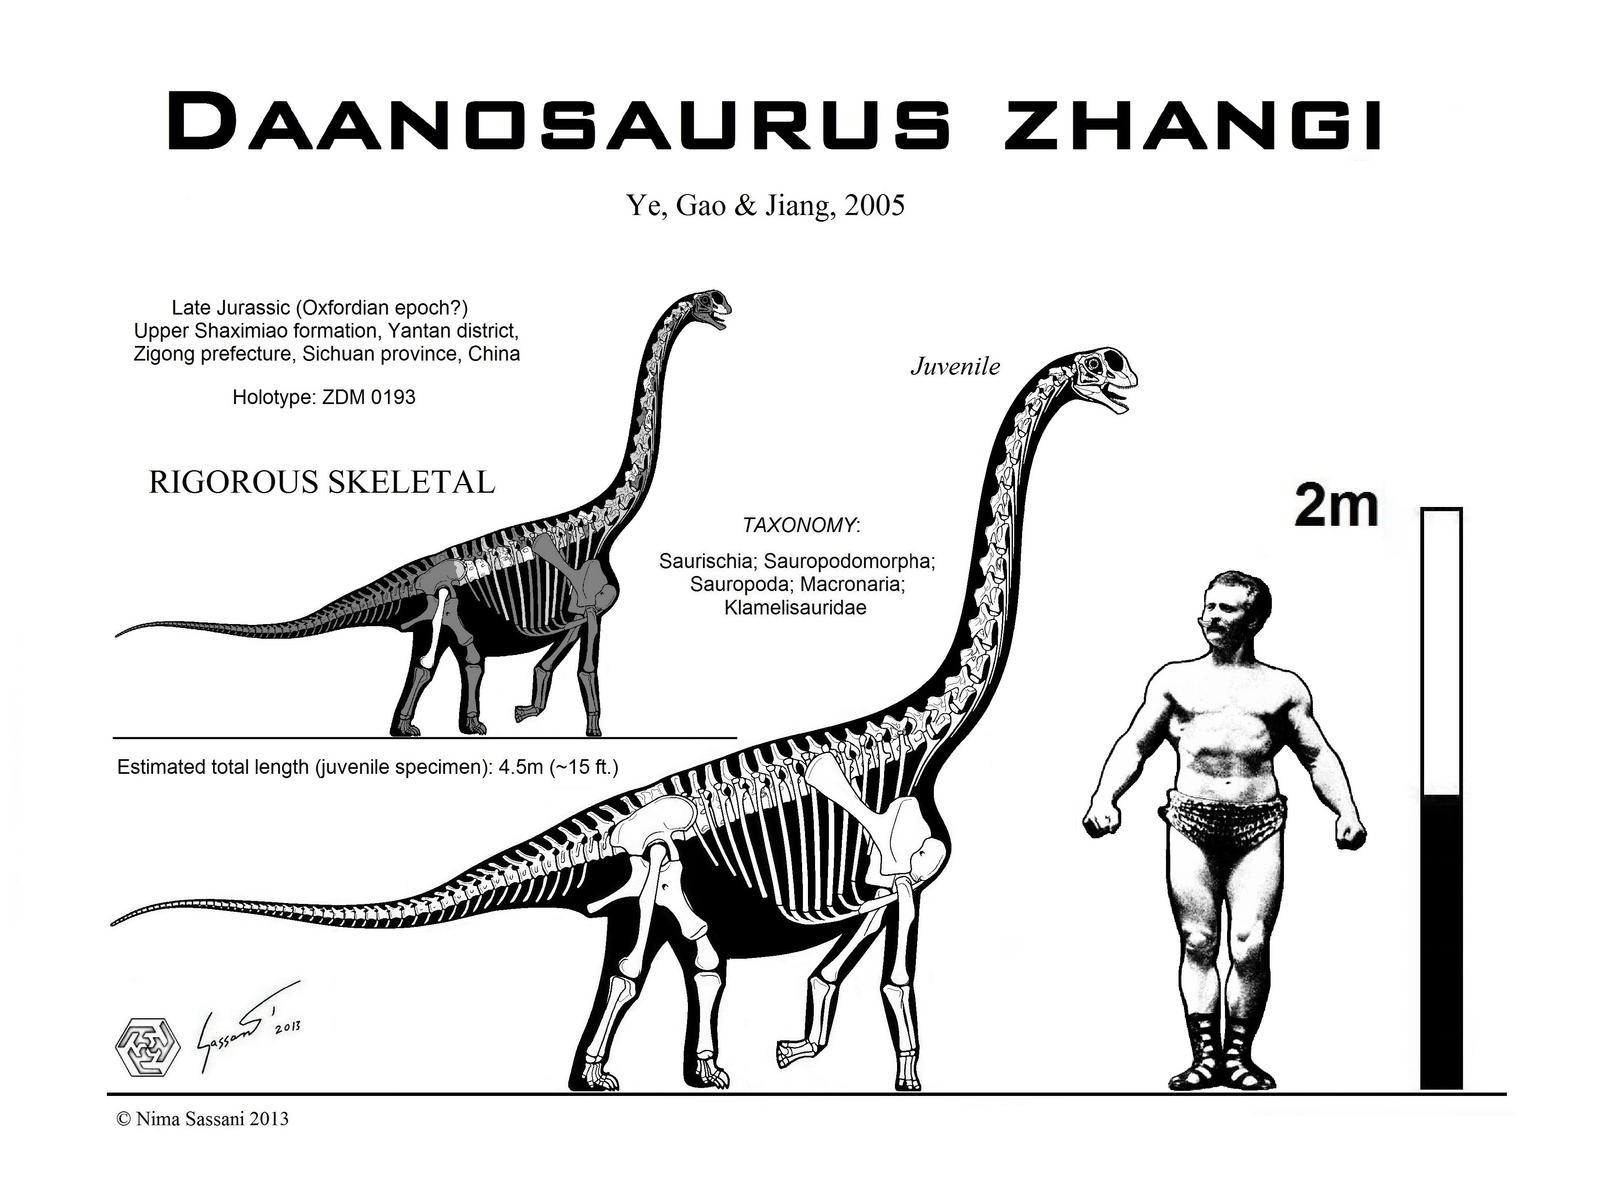 Daanosaurus zhangi skeletal